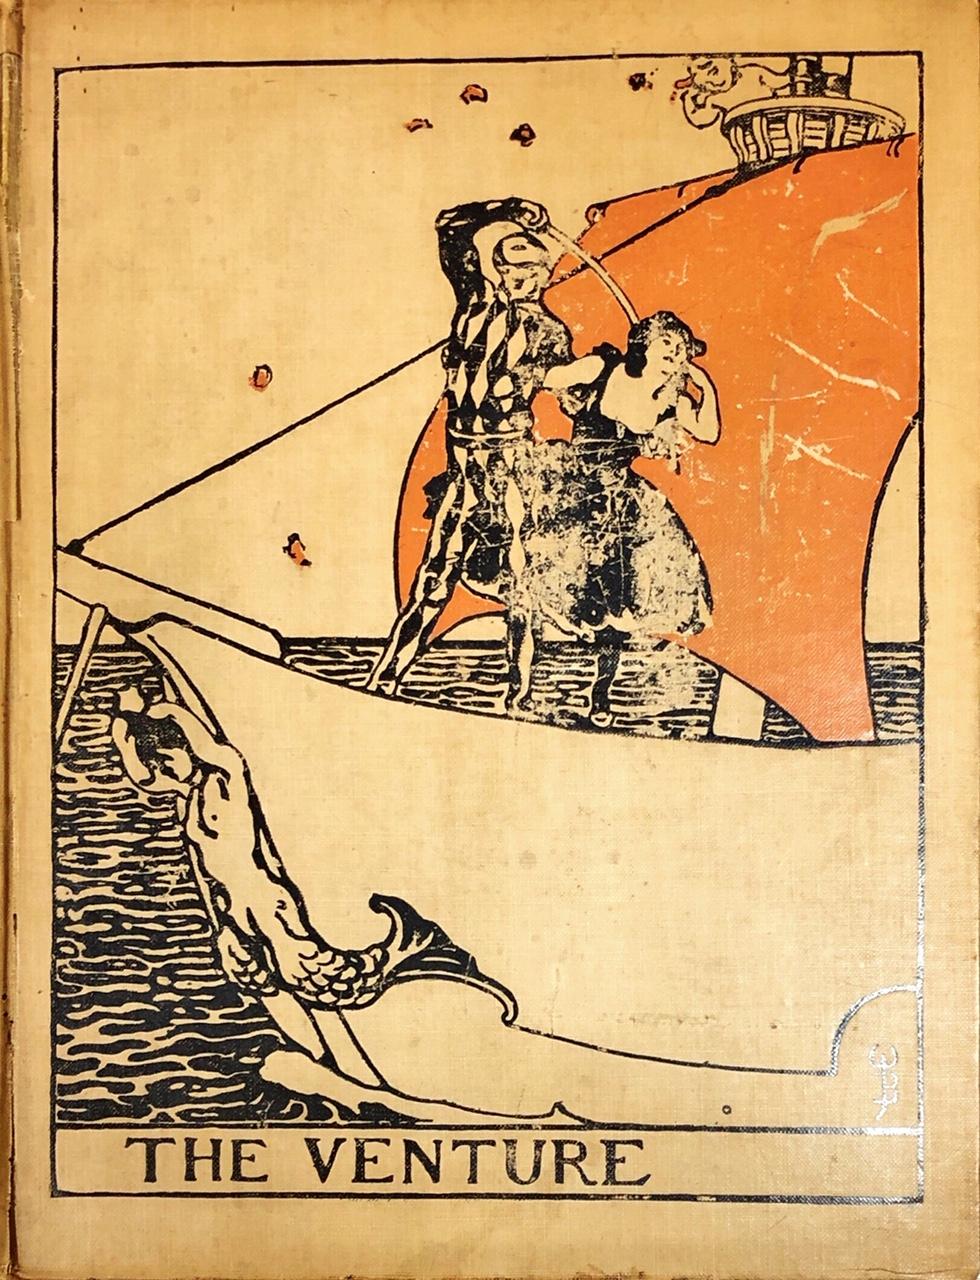 Lot 57 - Contributions by James Joyce, Oliver Gogarty etc.